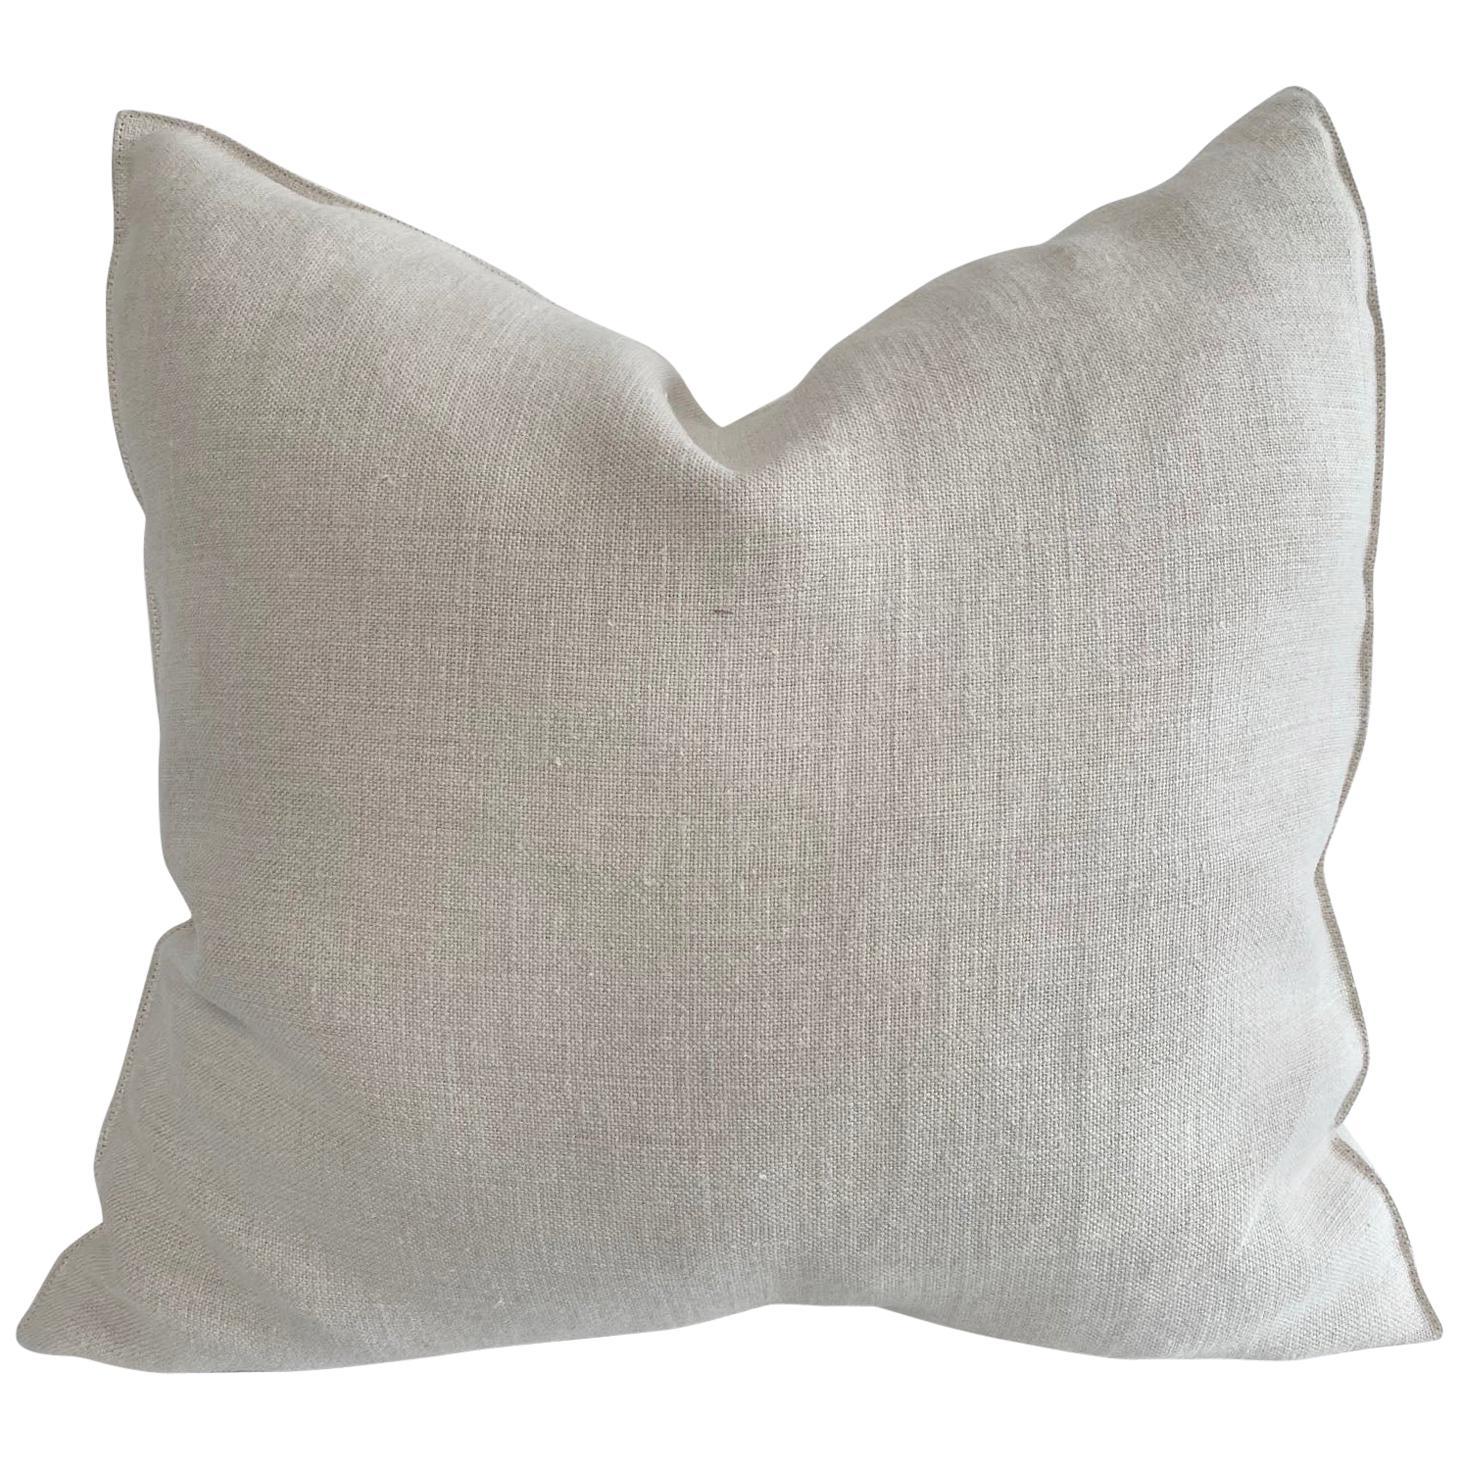 Natural Belgian Linen Accent Pillow Cover